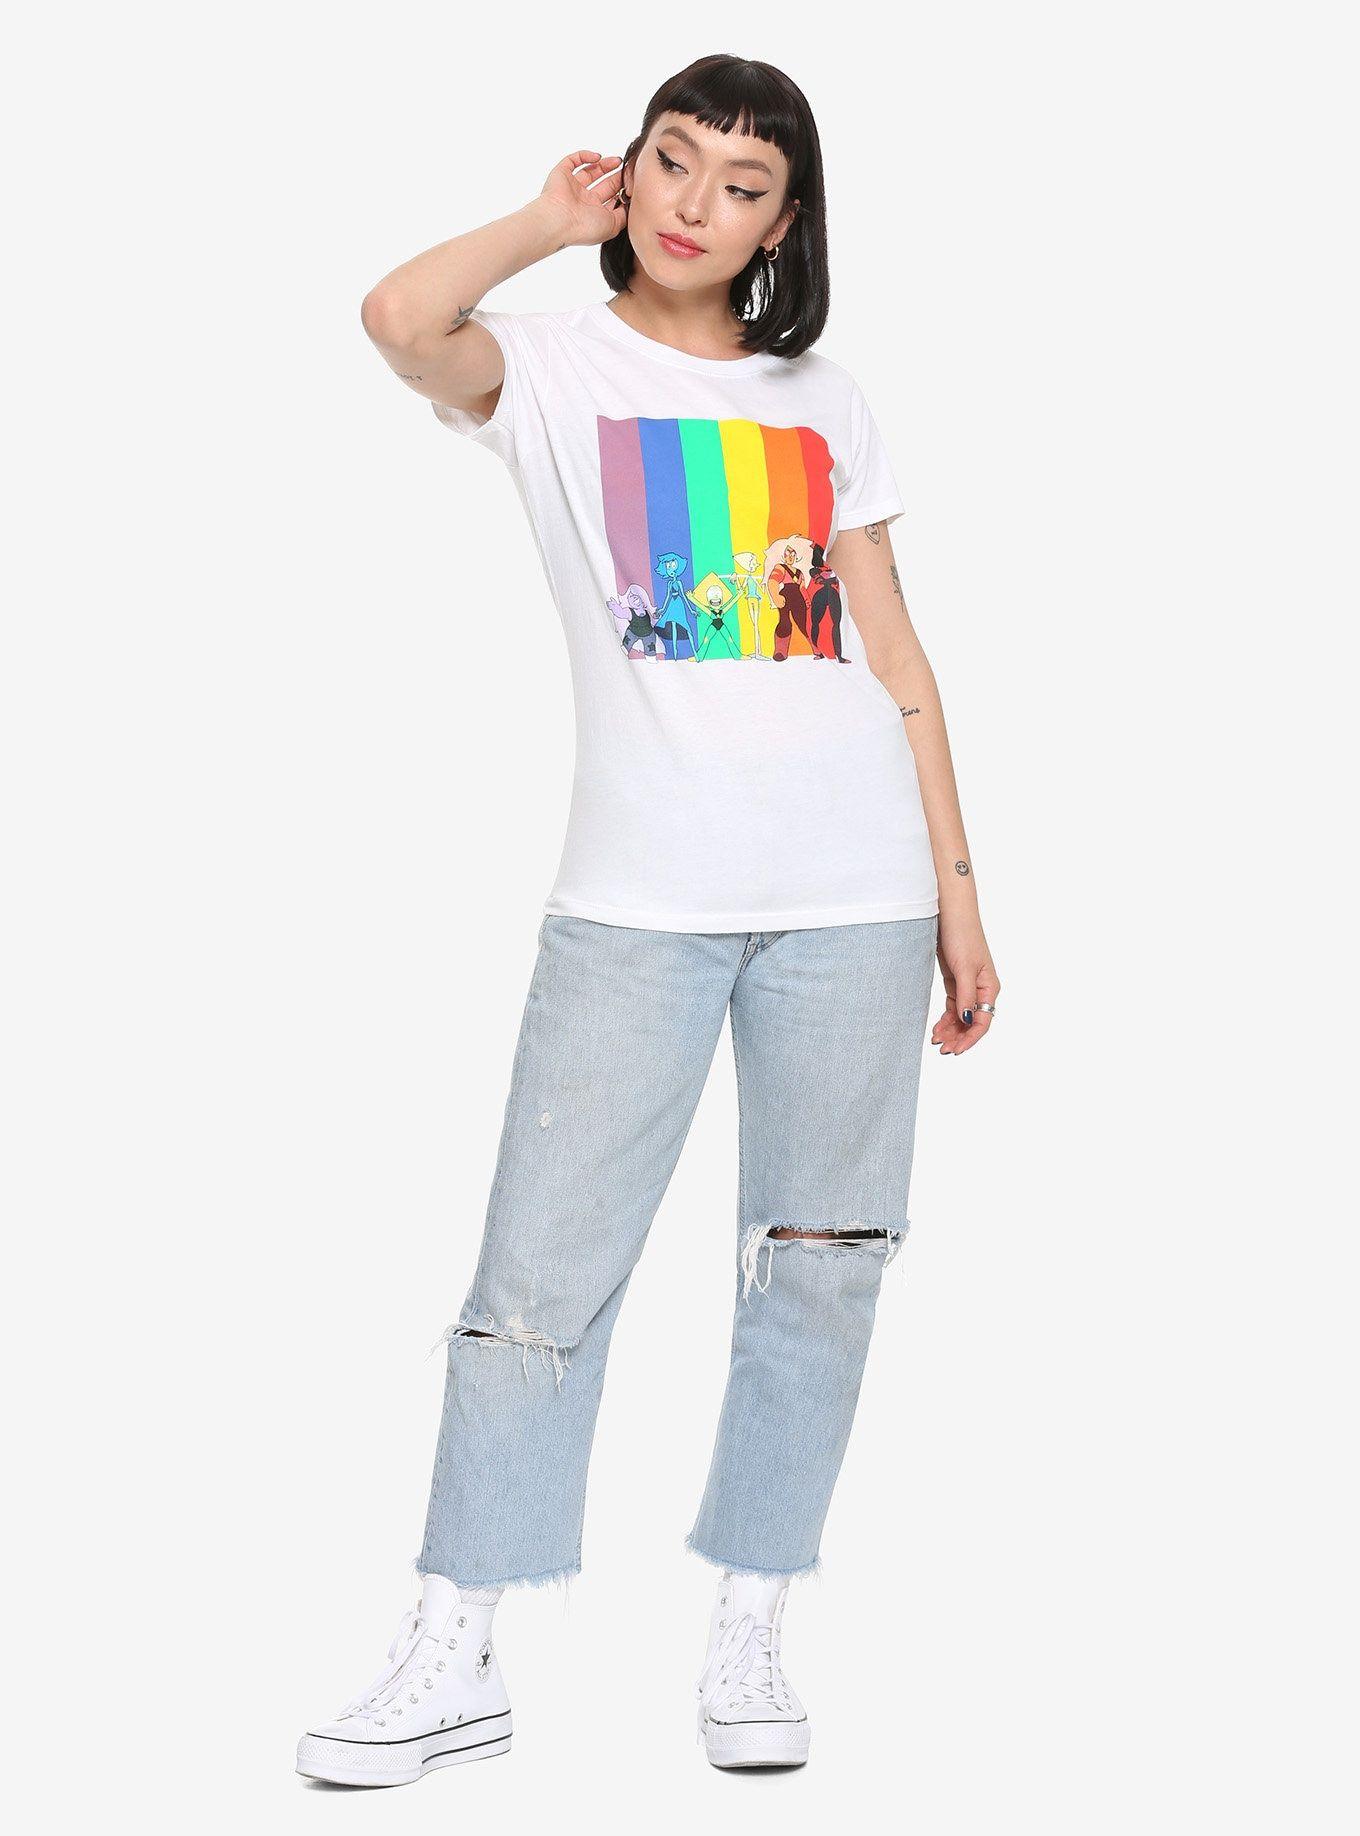 cc07632001cb5 Steven Universe Rainbow Girls T-Shirt | Clothes I want | Steven ...